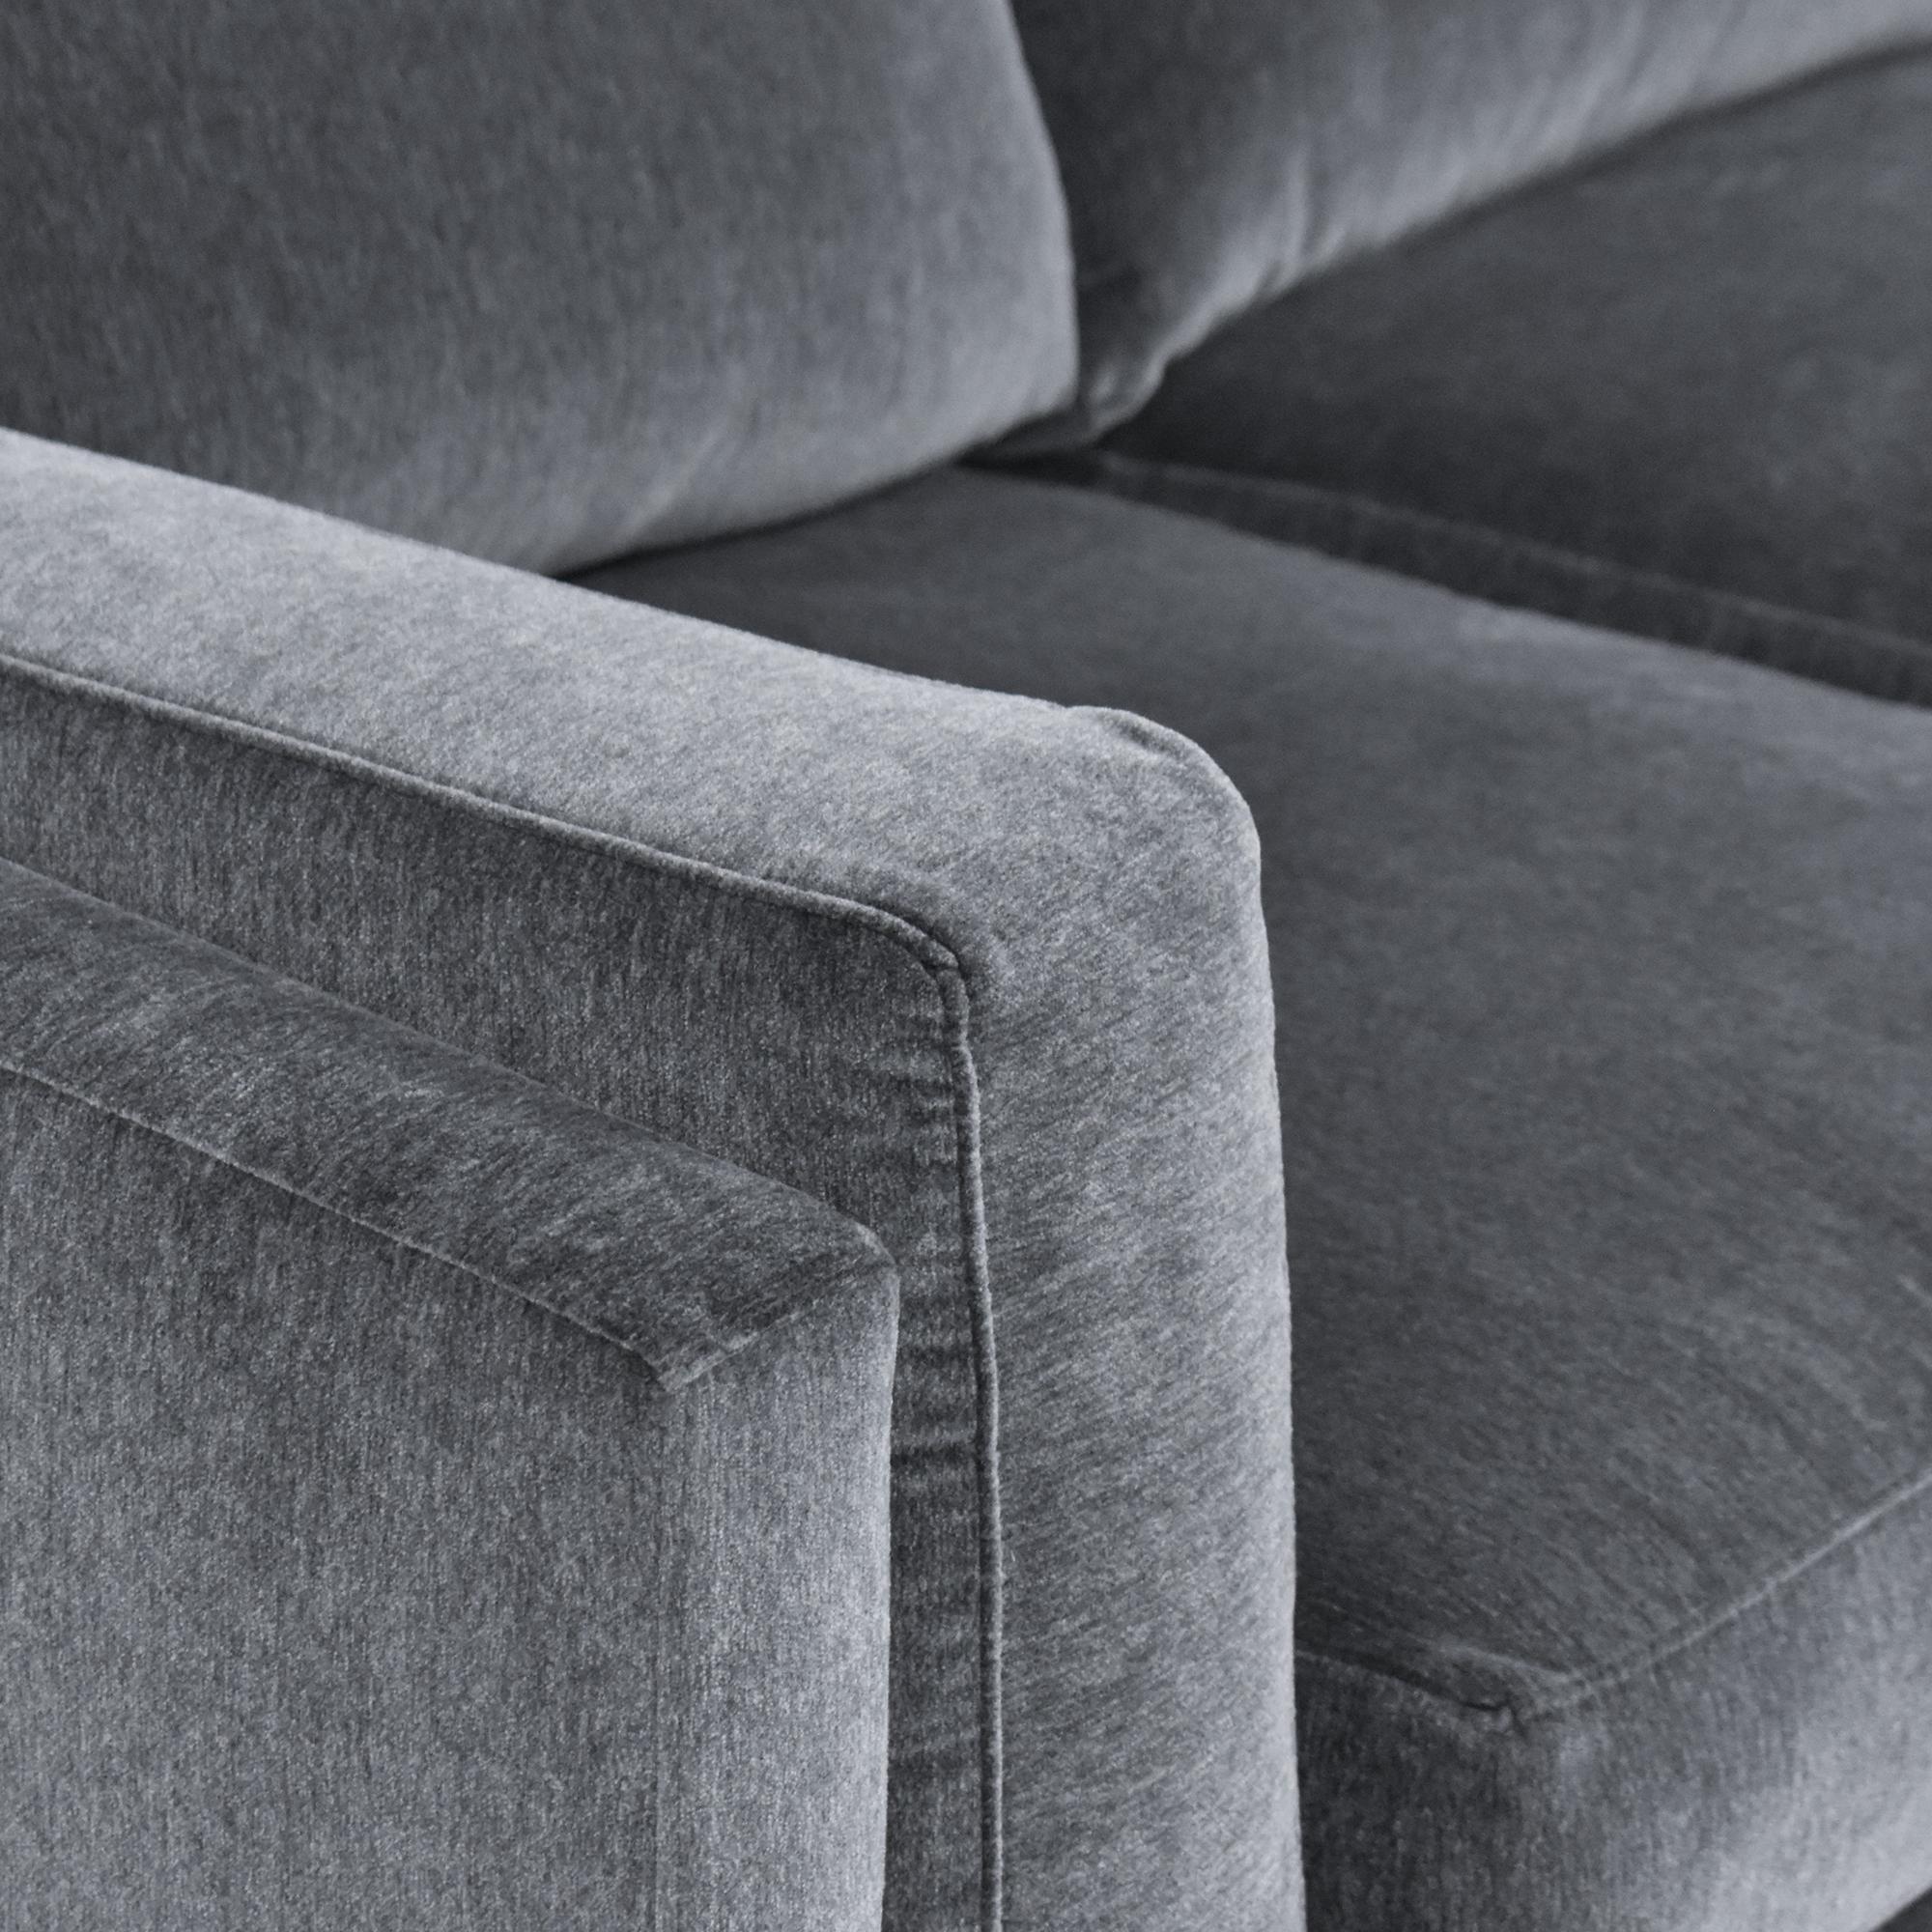 BenchMade Modern BenchMade Modern Skinny Fat Sofa ma